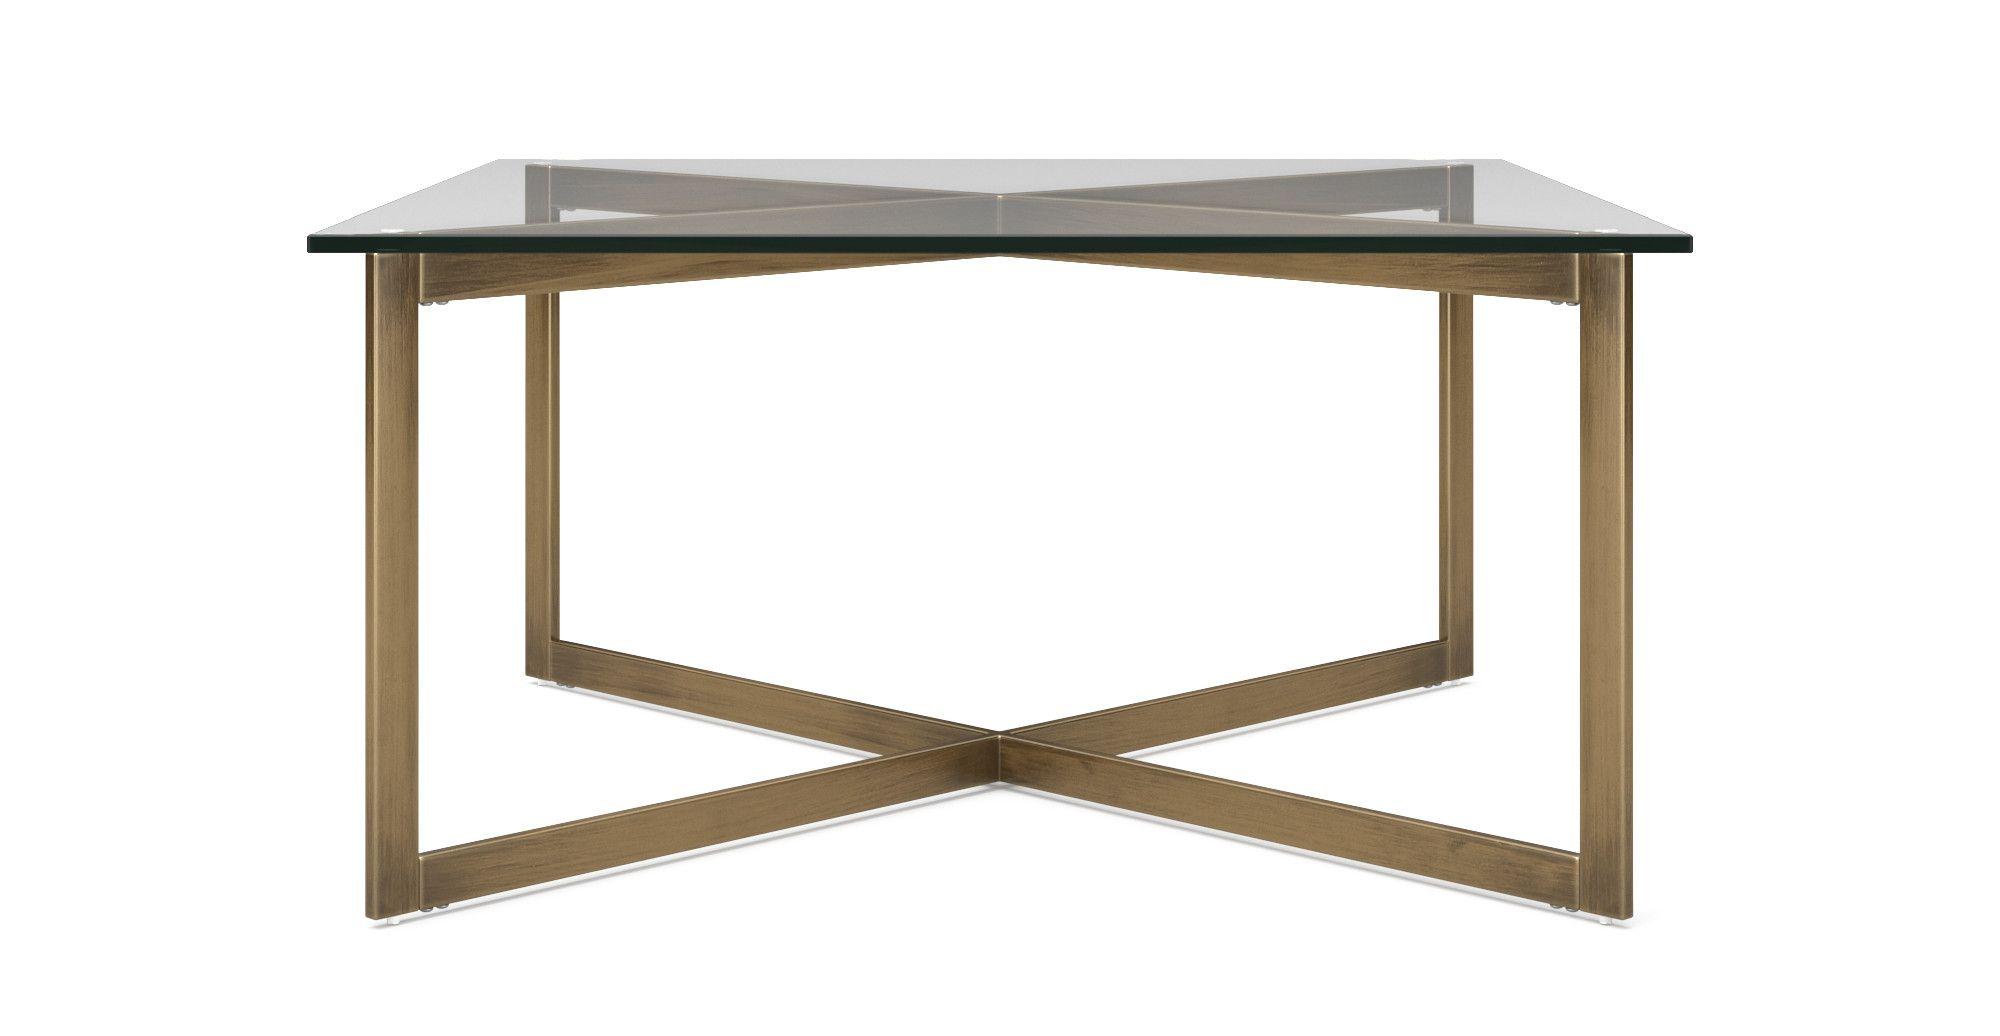 Kipling Coffee Table Scandinavian Coffee Table Table Coffee Table [ 1036 x 2000 Pixel ]